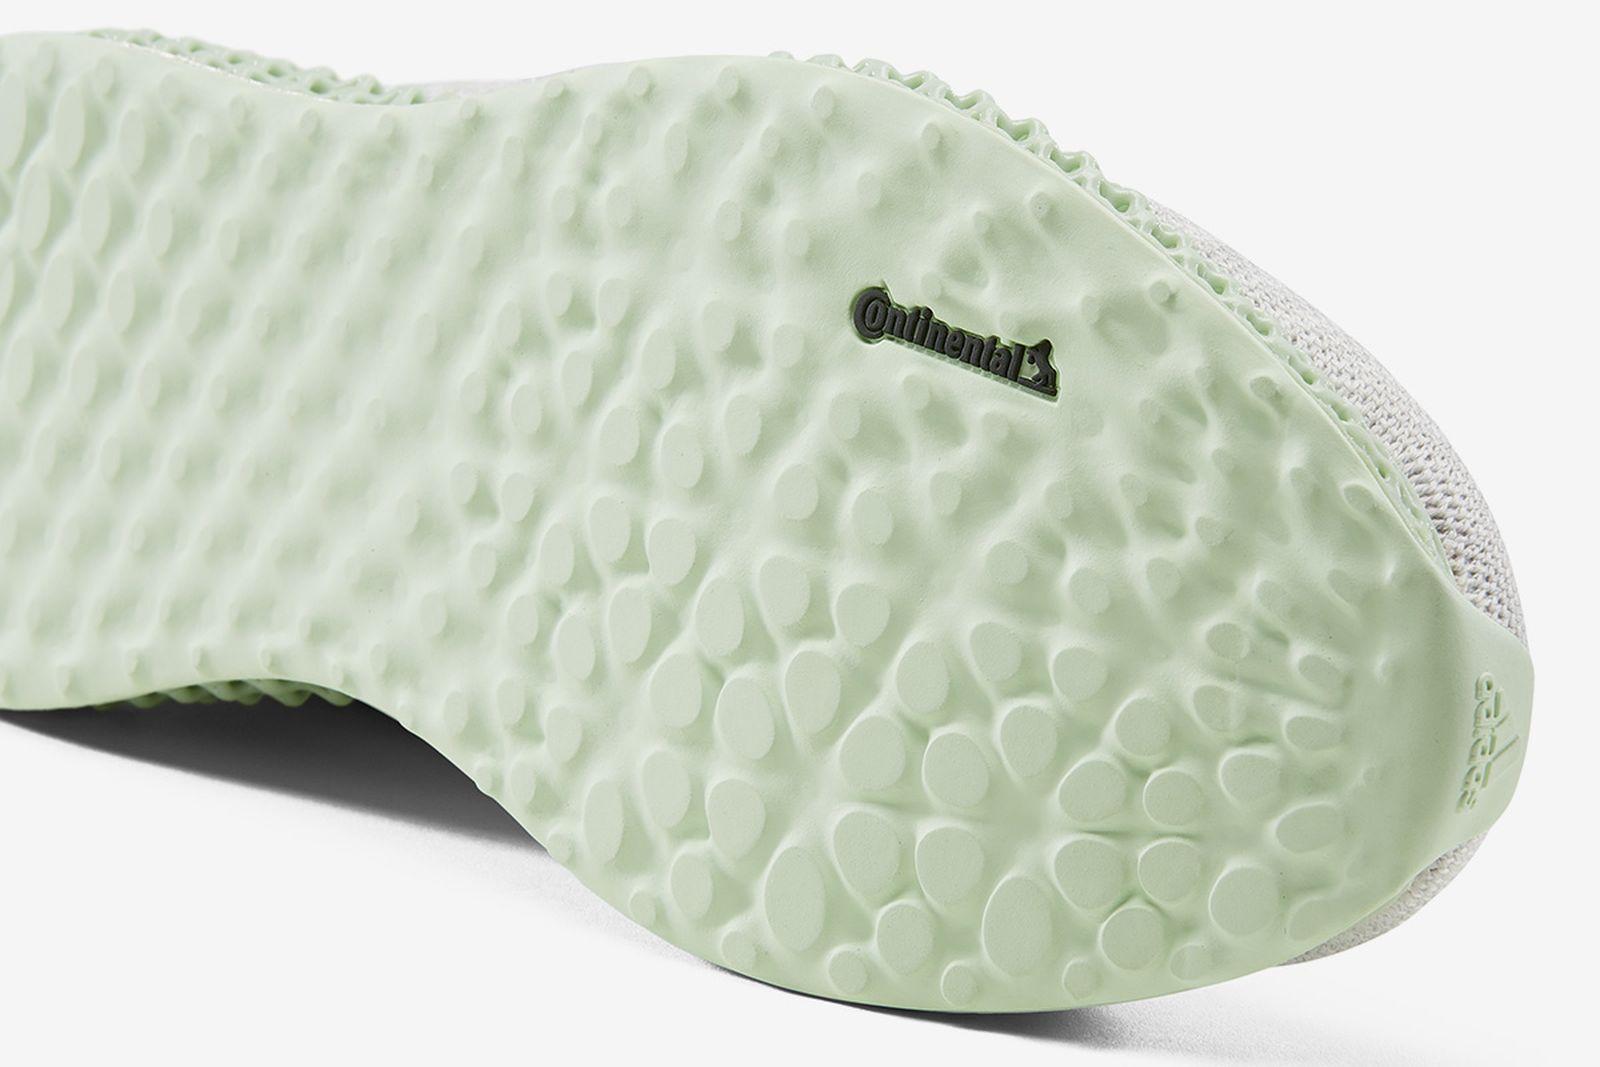 adidas consortium runner 4d mid release date price adidas Consortium Runner Mid 4D